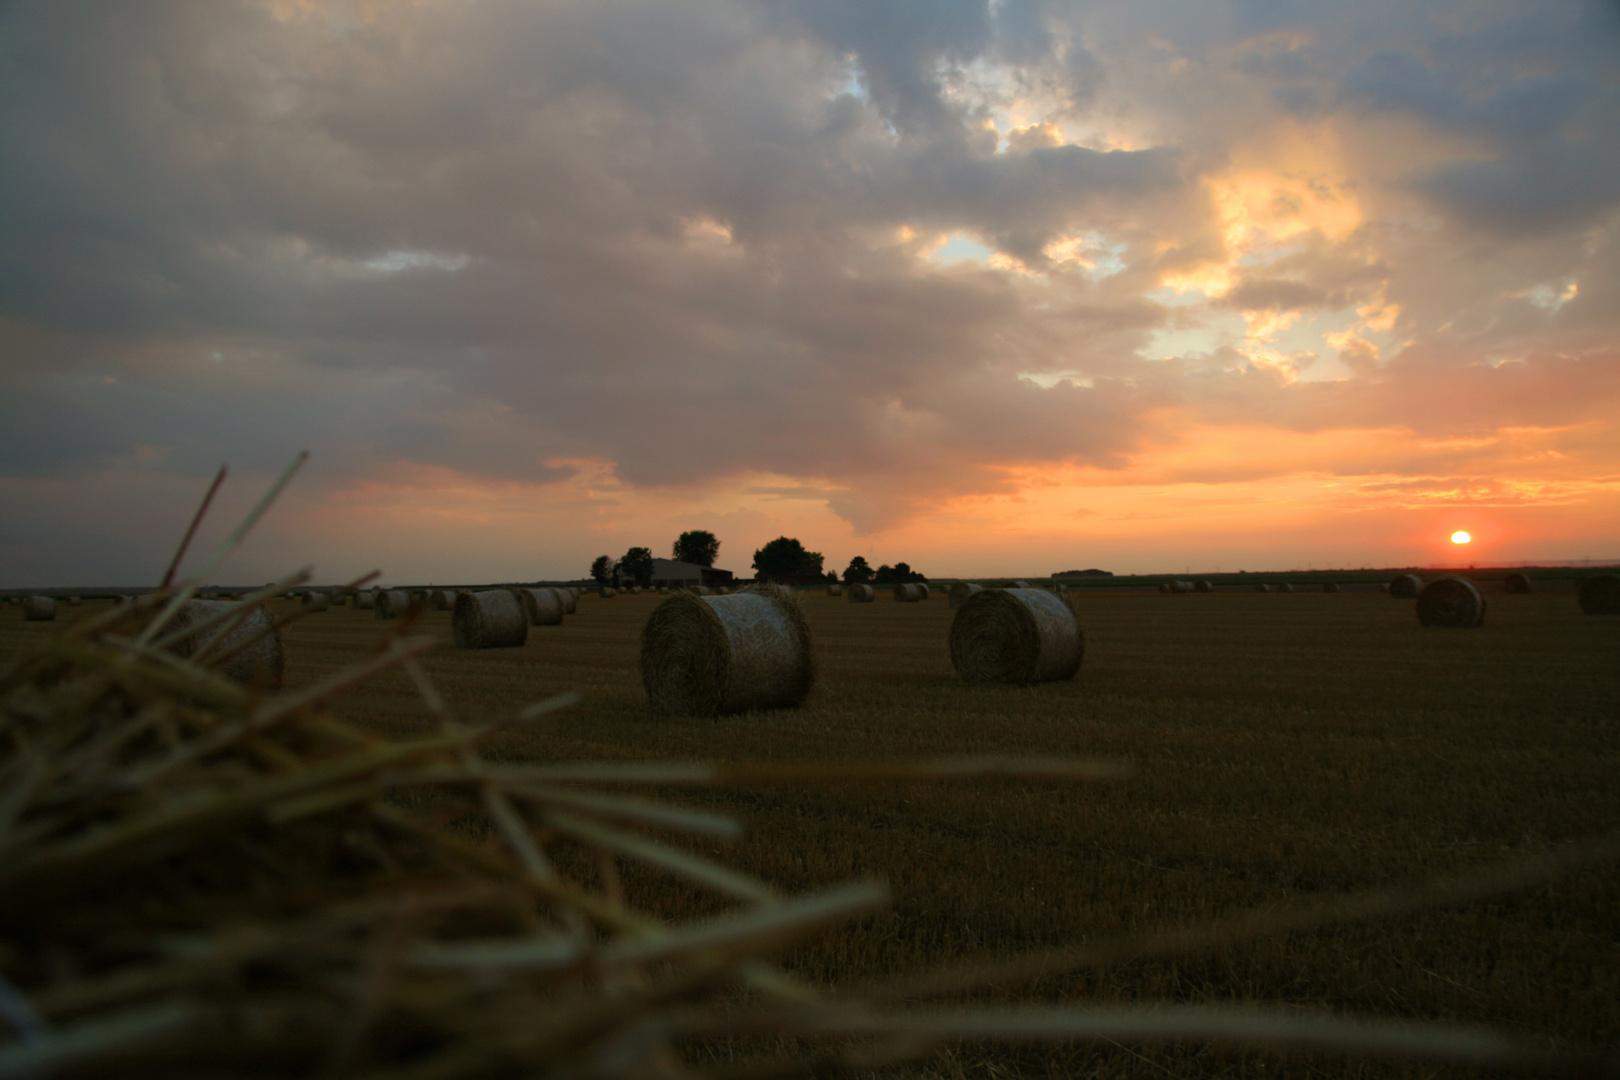 Sonnenuntergang im Feld